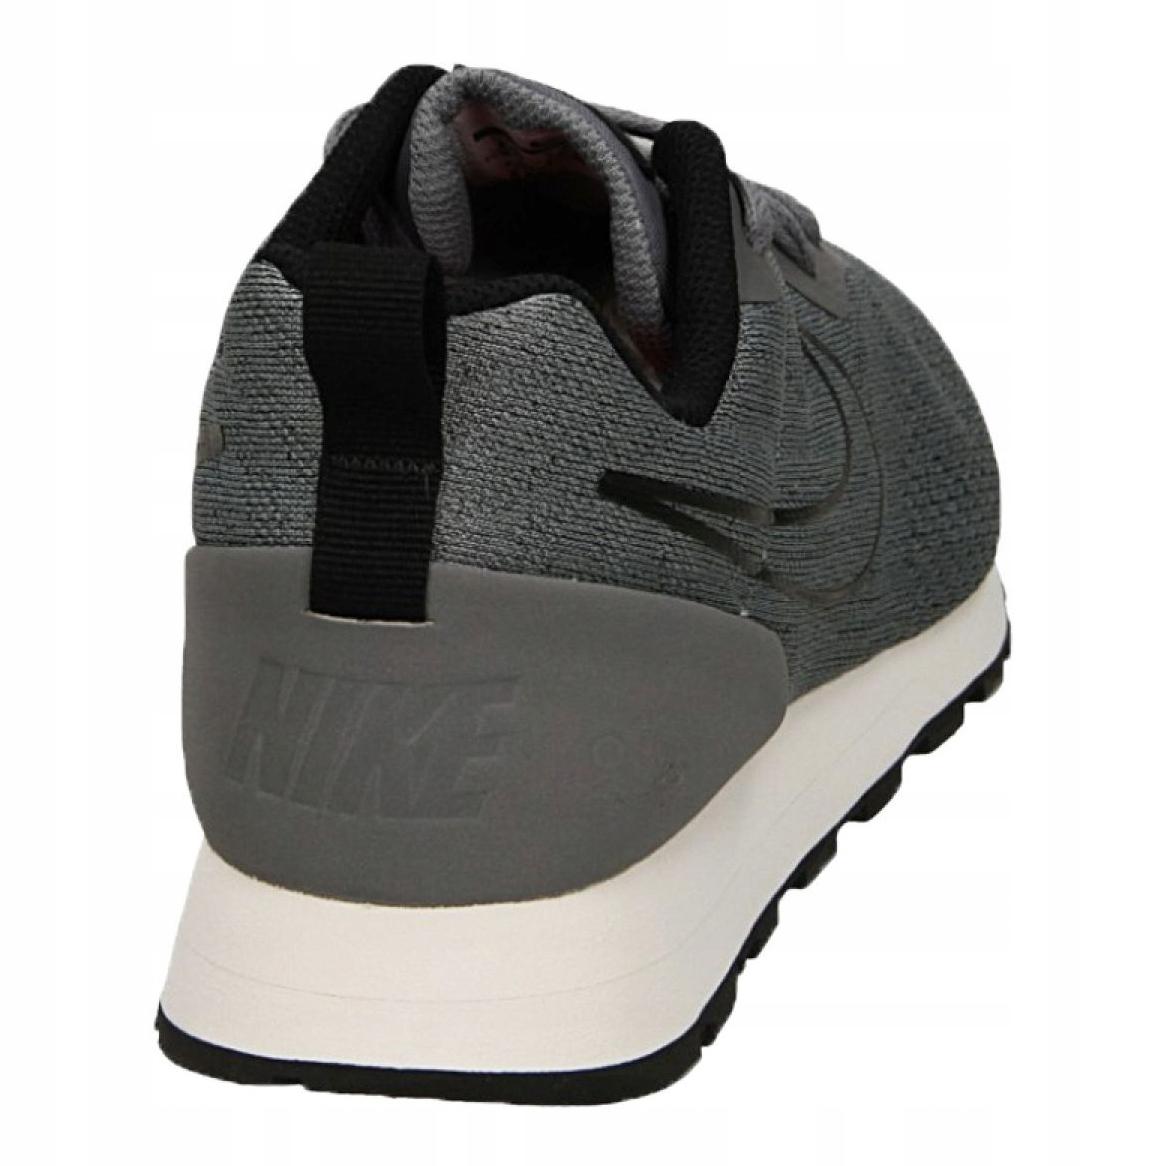 Nike Md Runner 2 Eng Mesh M 916774 001 shoes grey